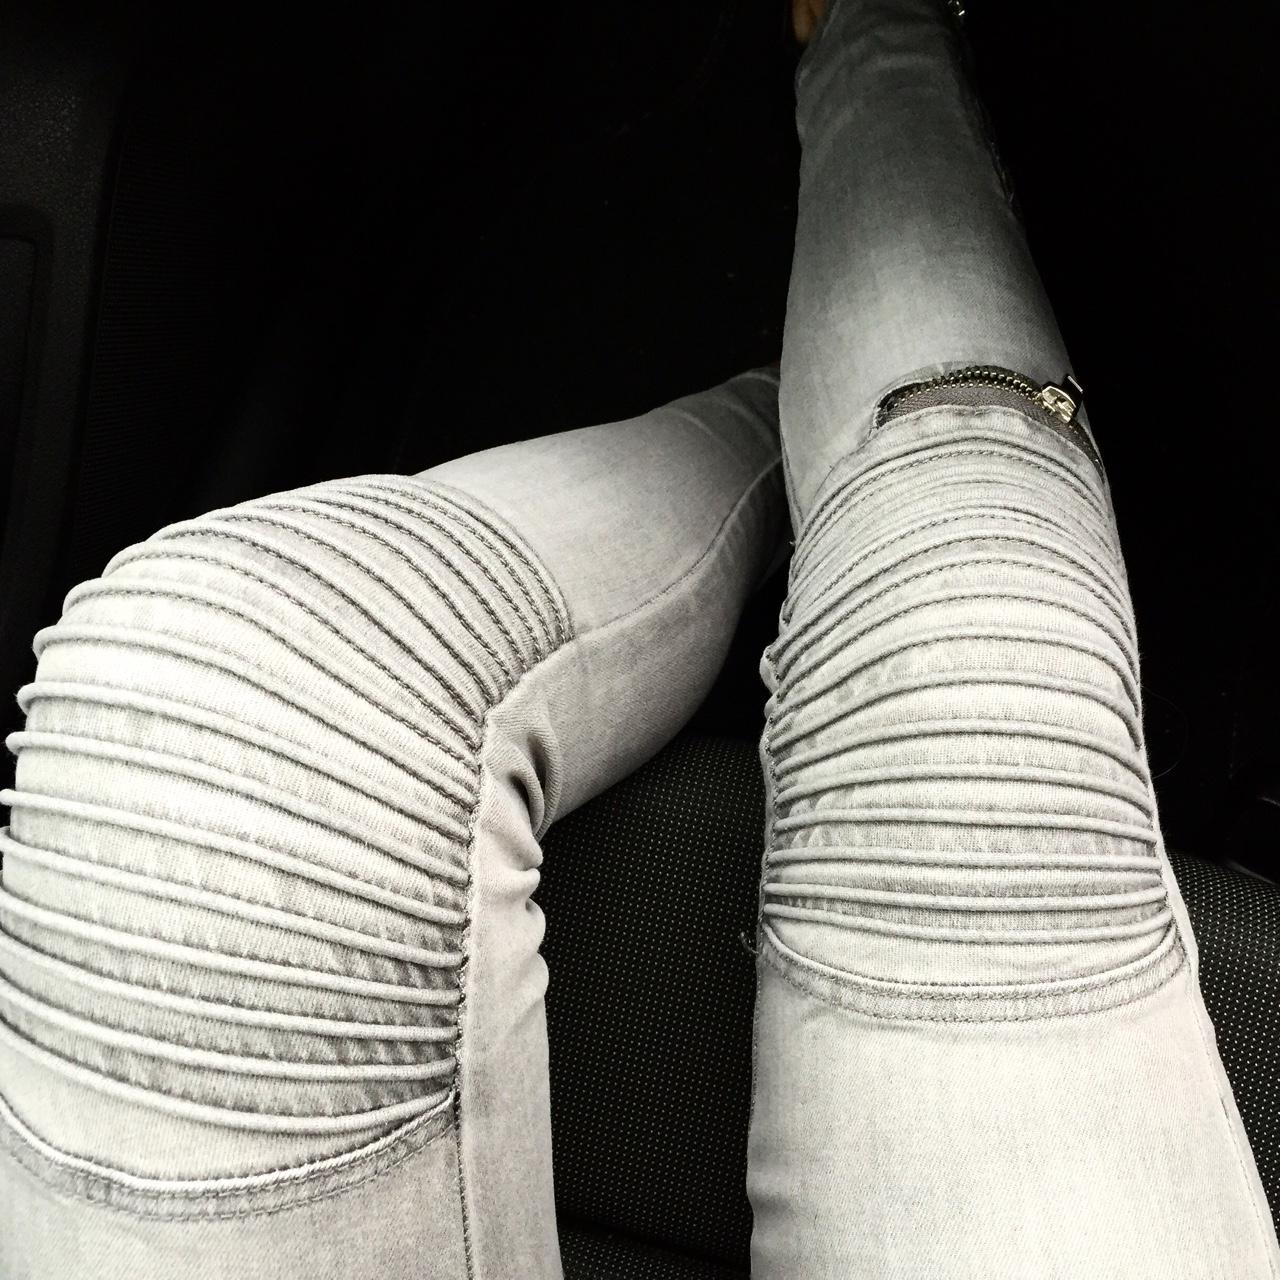 Biker Jeans Grey Biker Jeans from H&M (hmstreetstyle) with ridges & zip details. //SHE